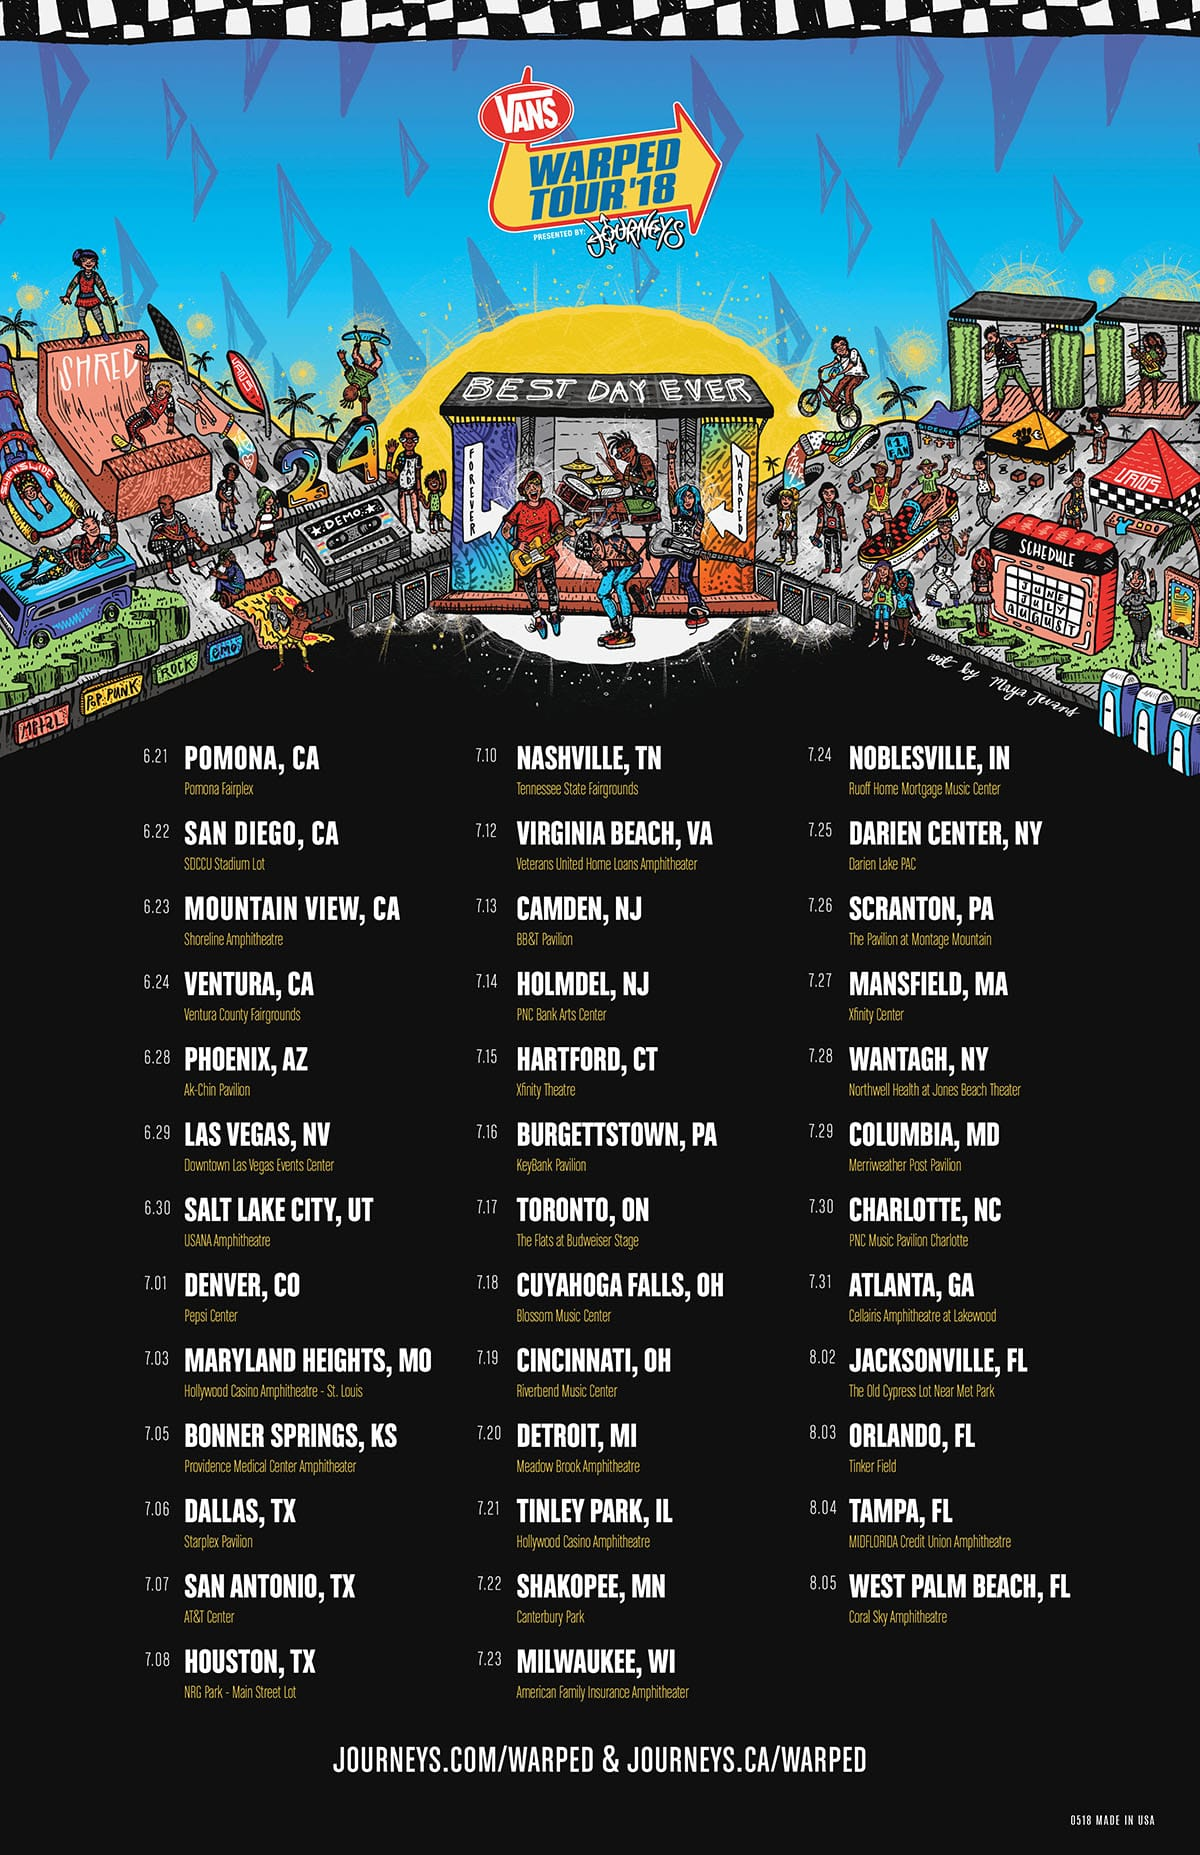 Tour Dates - Vans Warped Tour 2018